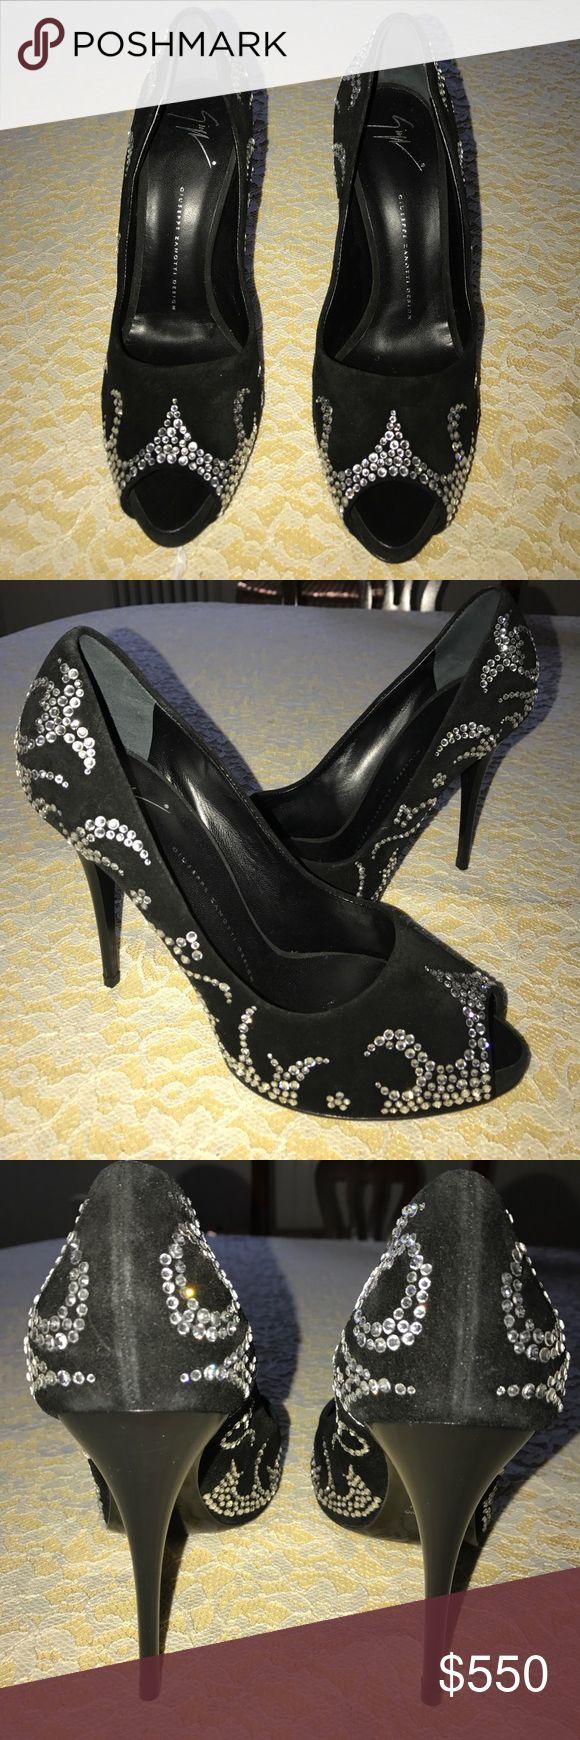 Giuseppe Zanotti Design Rhinestone Heel Stunning rhinestone heels NEVER WORN Giuseppe Zanotti Shoes Heels